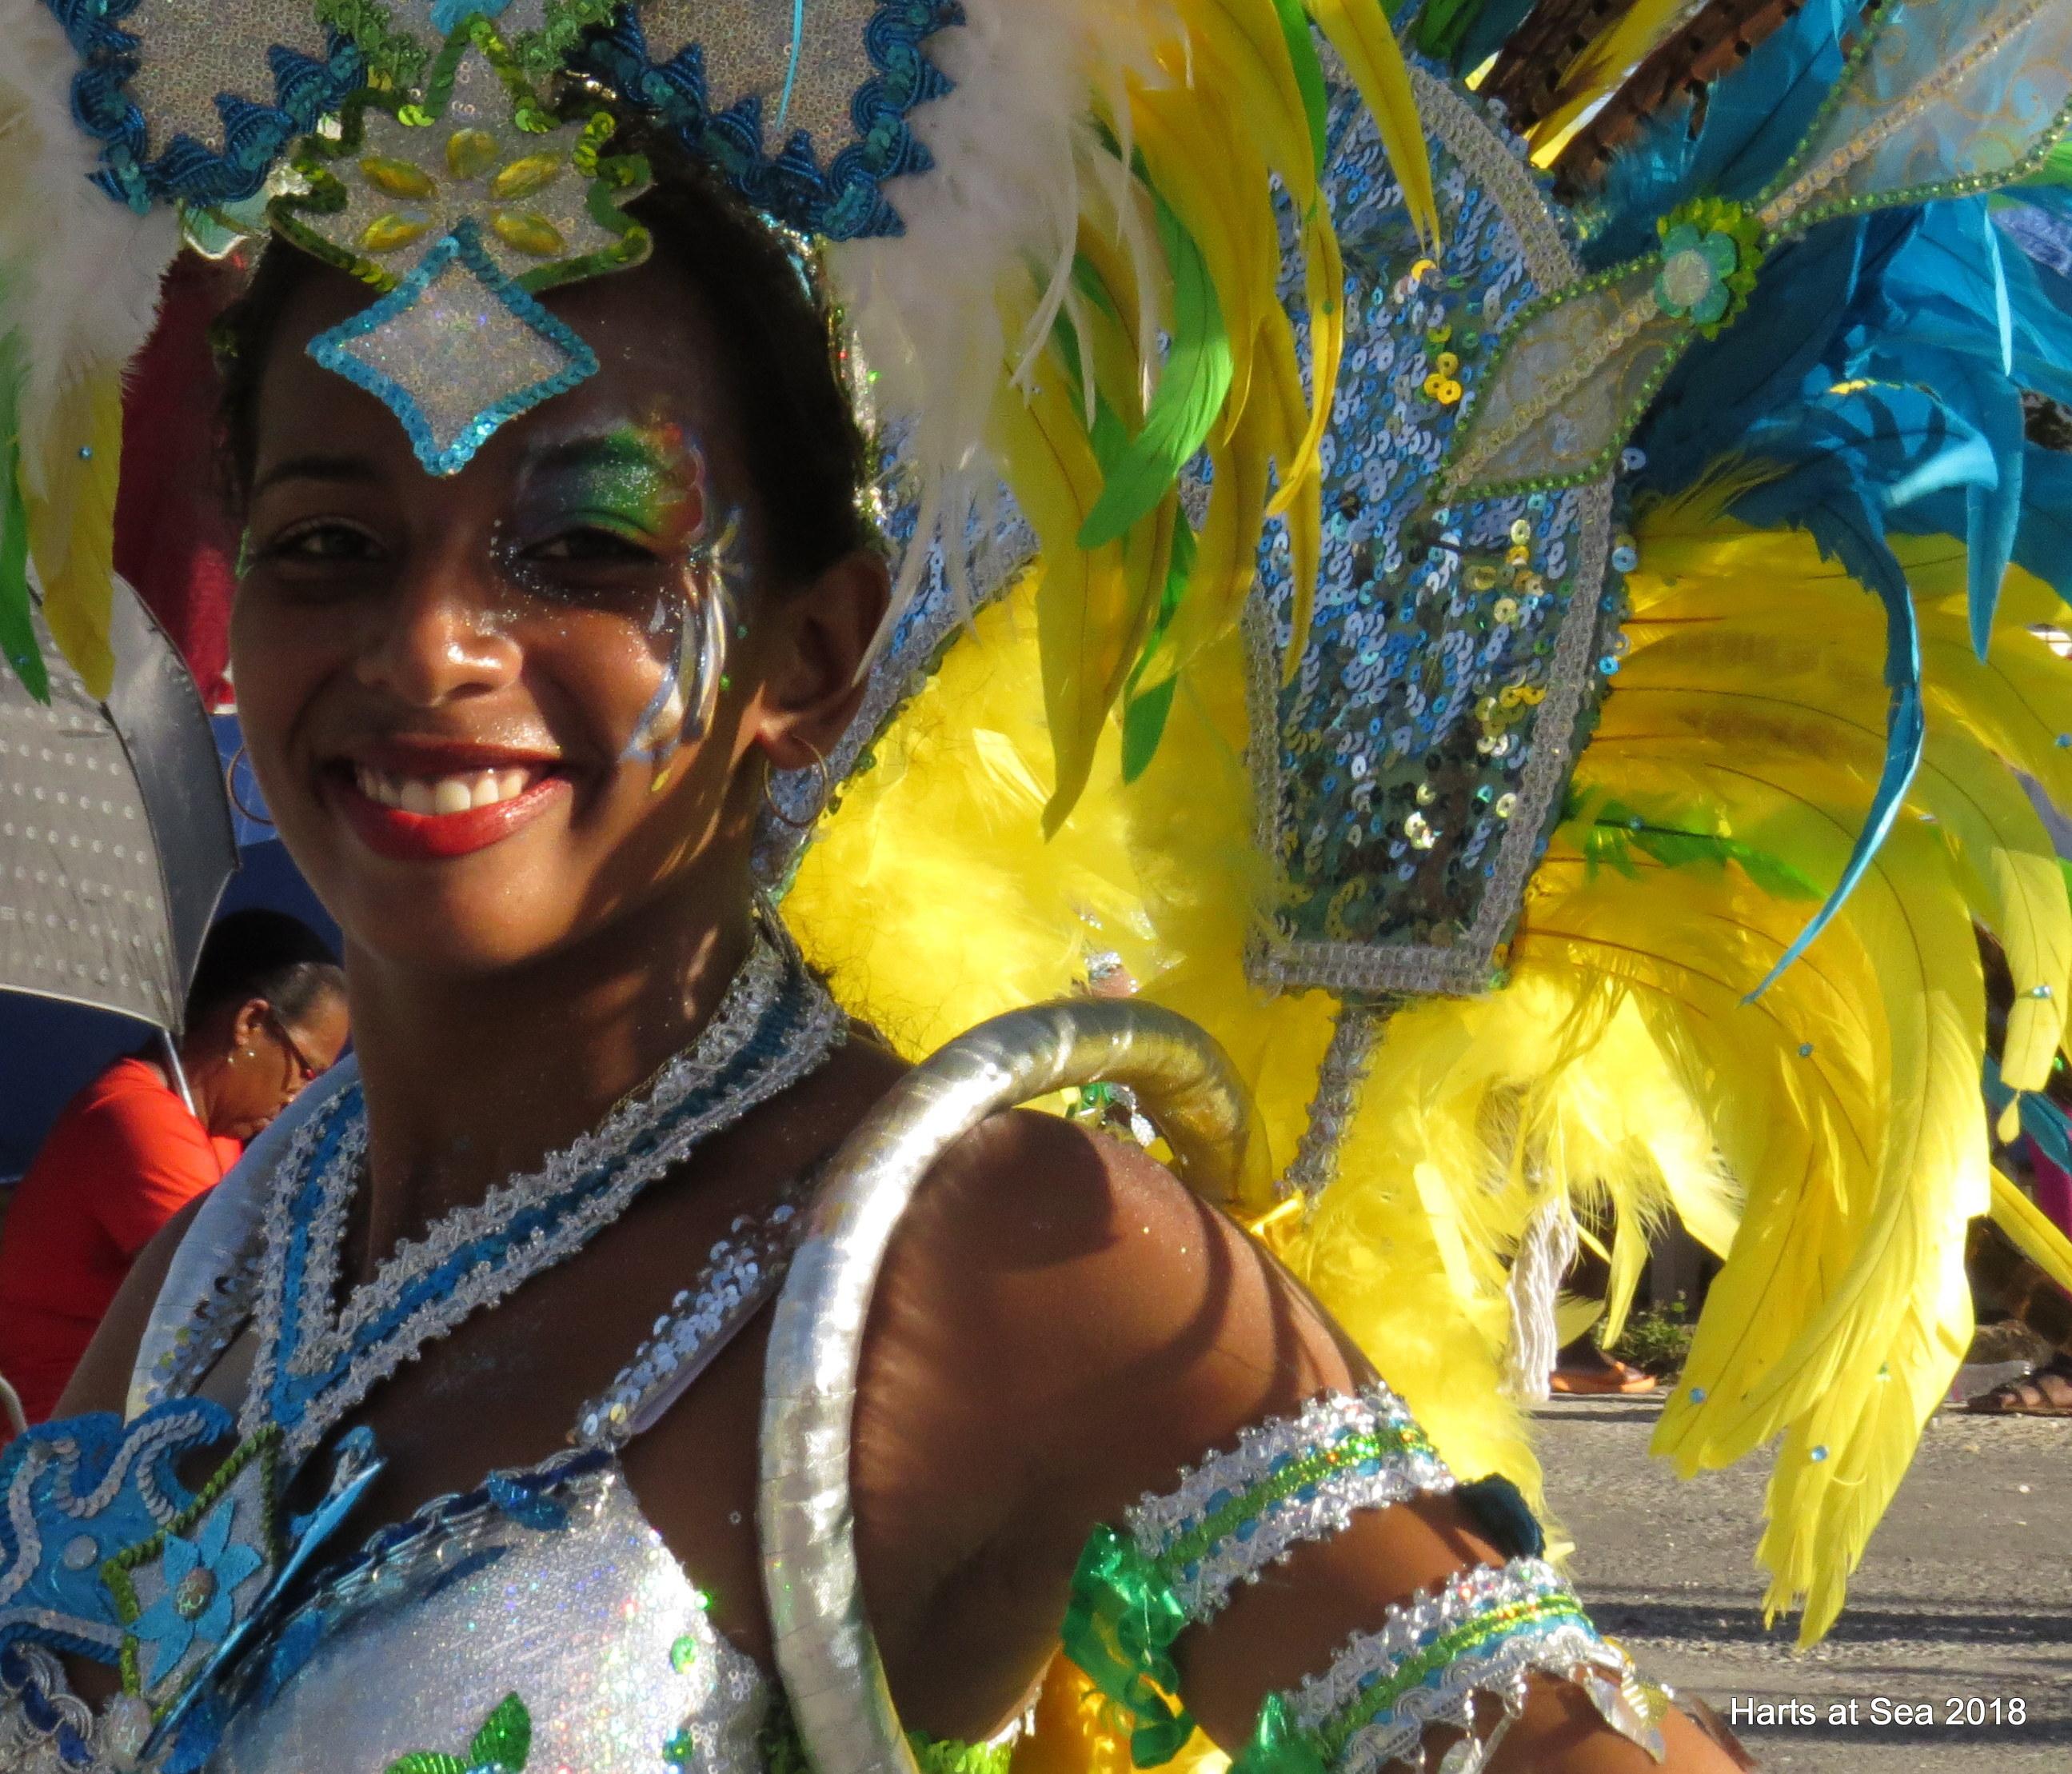 Mardi Gras and Caribbean Carnivals